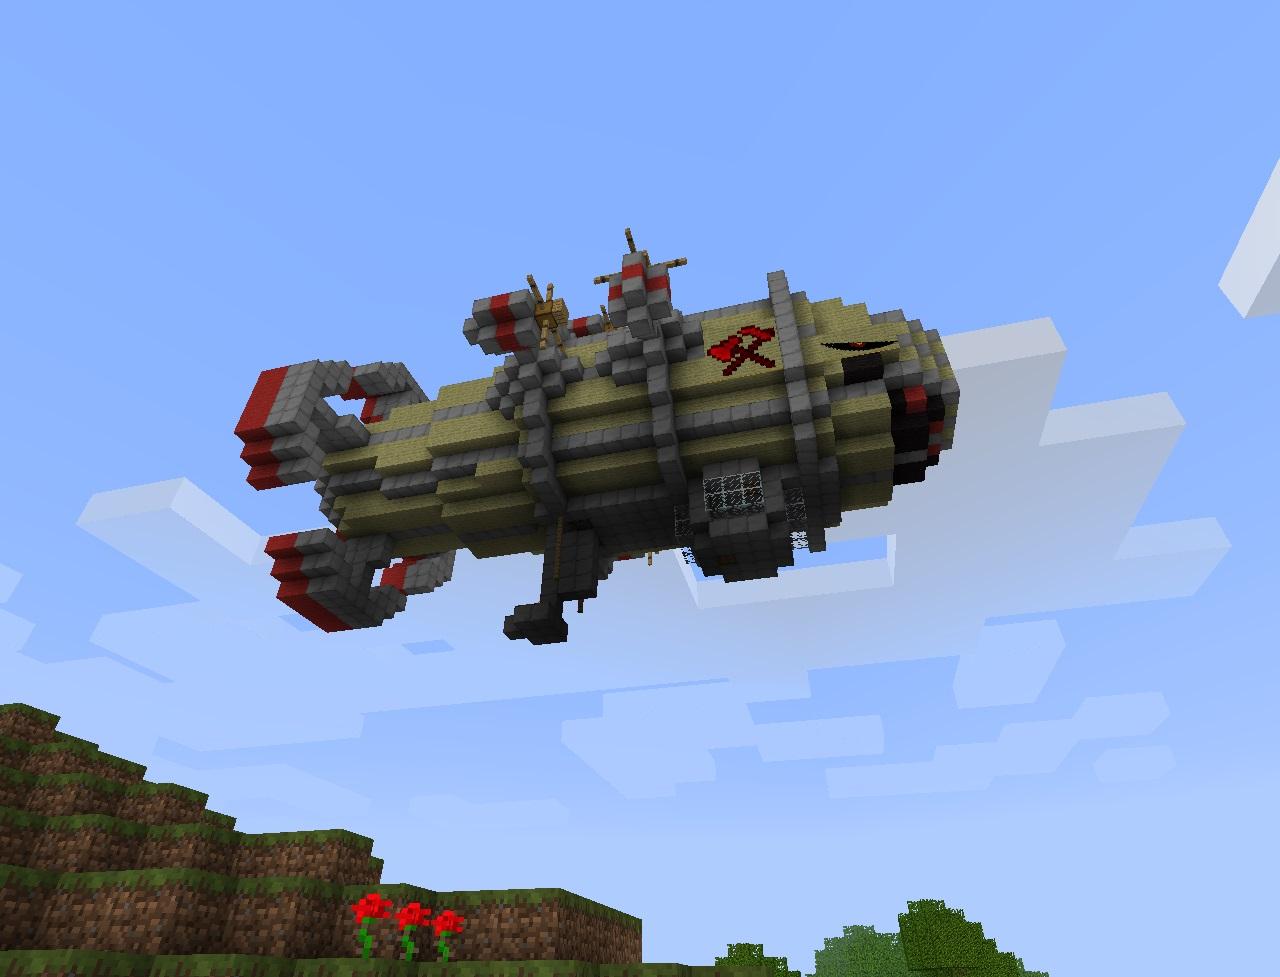 Скачать Aircraft (Zeppelin) мод на самолеты на Майнкрафт 1.5.2/1.6.4/1.7.2/1.7.10